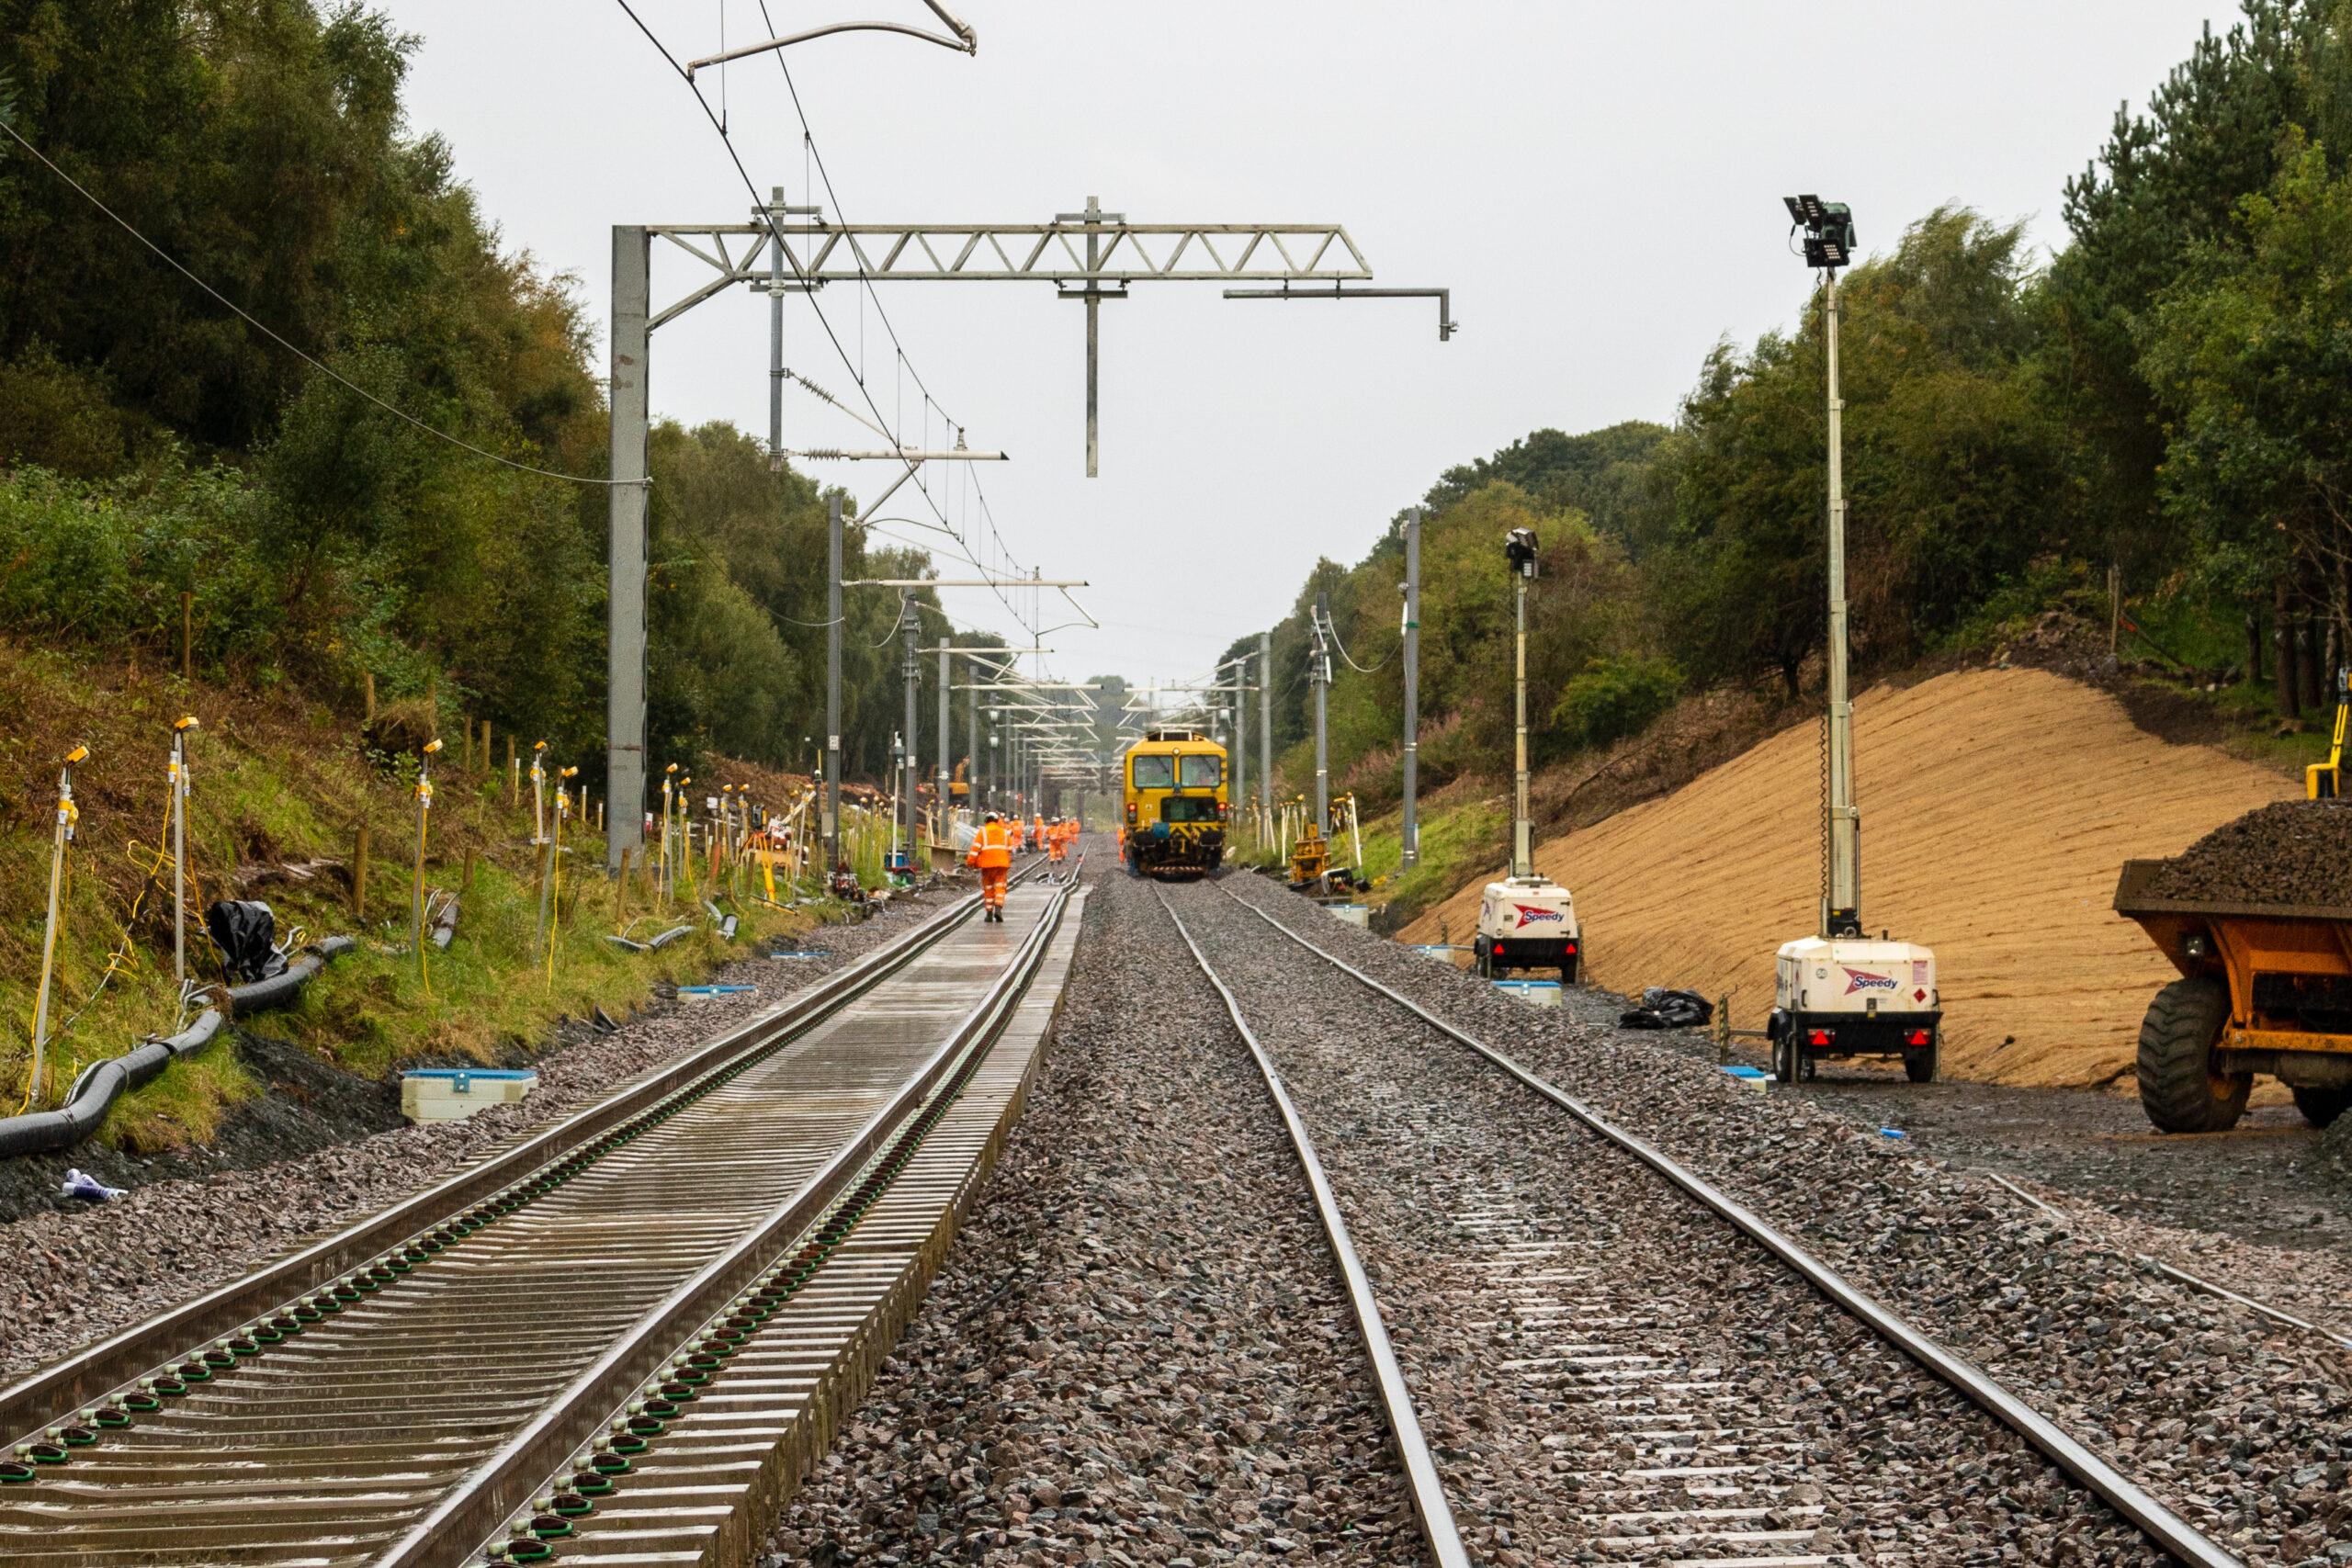 Edinburgh-Glasgow line repair works